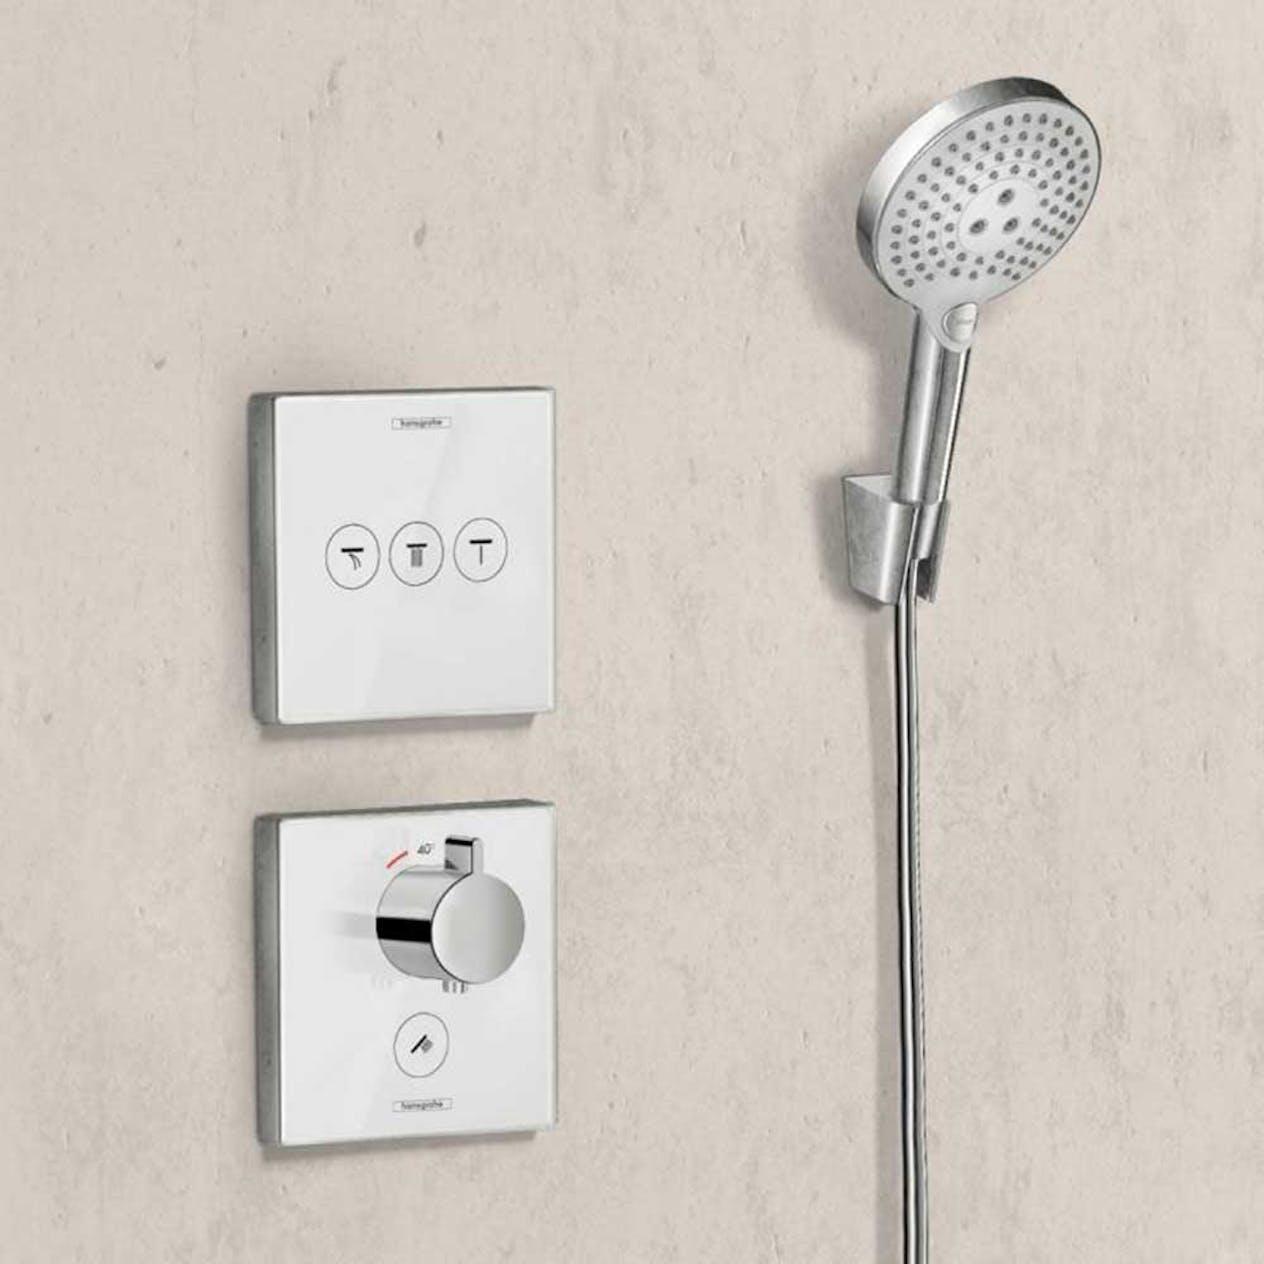 Duschblandare Hansgrohe ShowerSelect Glass 3 Funktioner Vit Krom. 30%. tom 1 4.  Kampanj 997350e2aad4b